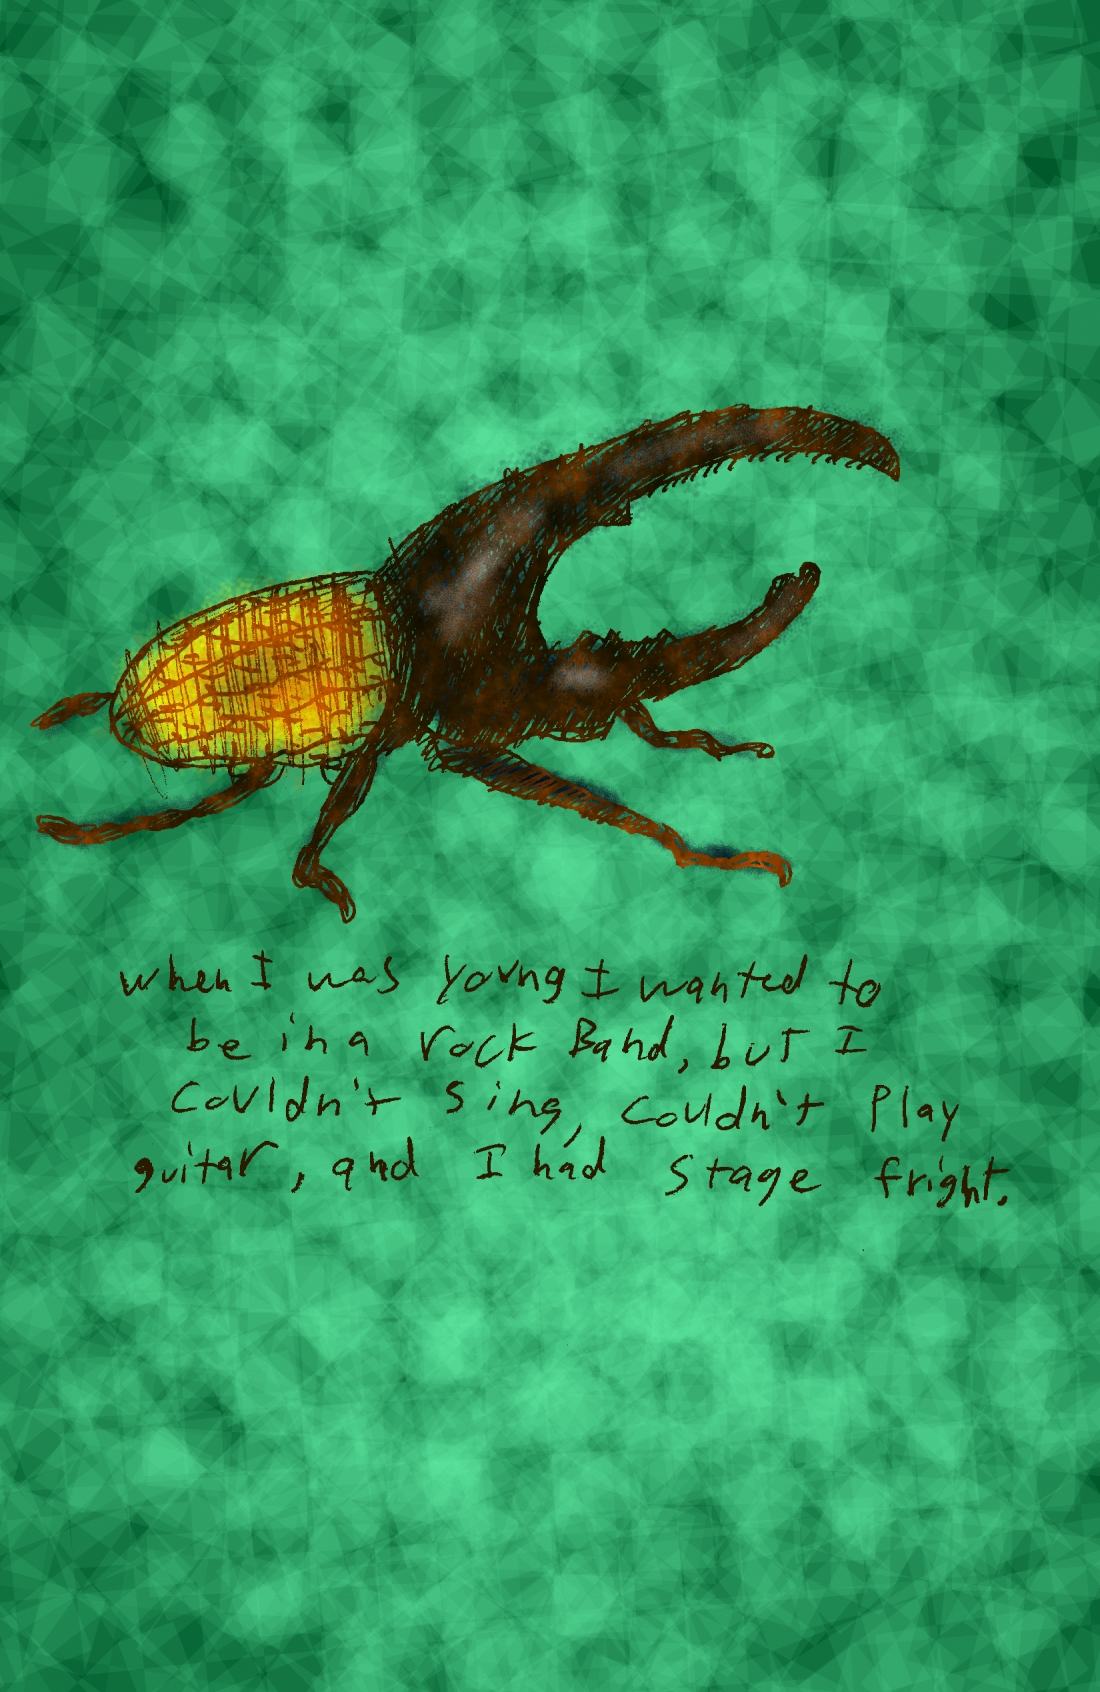 bugs pg 17 c